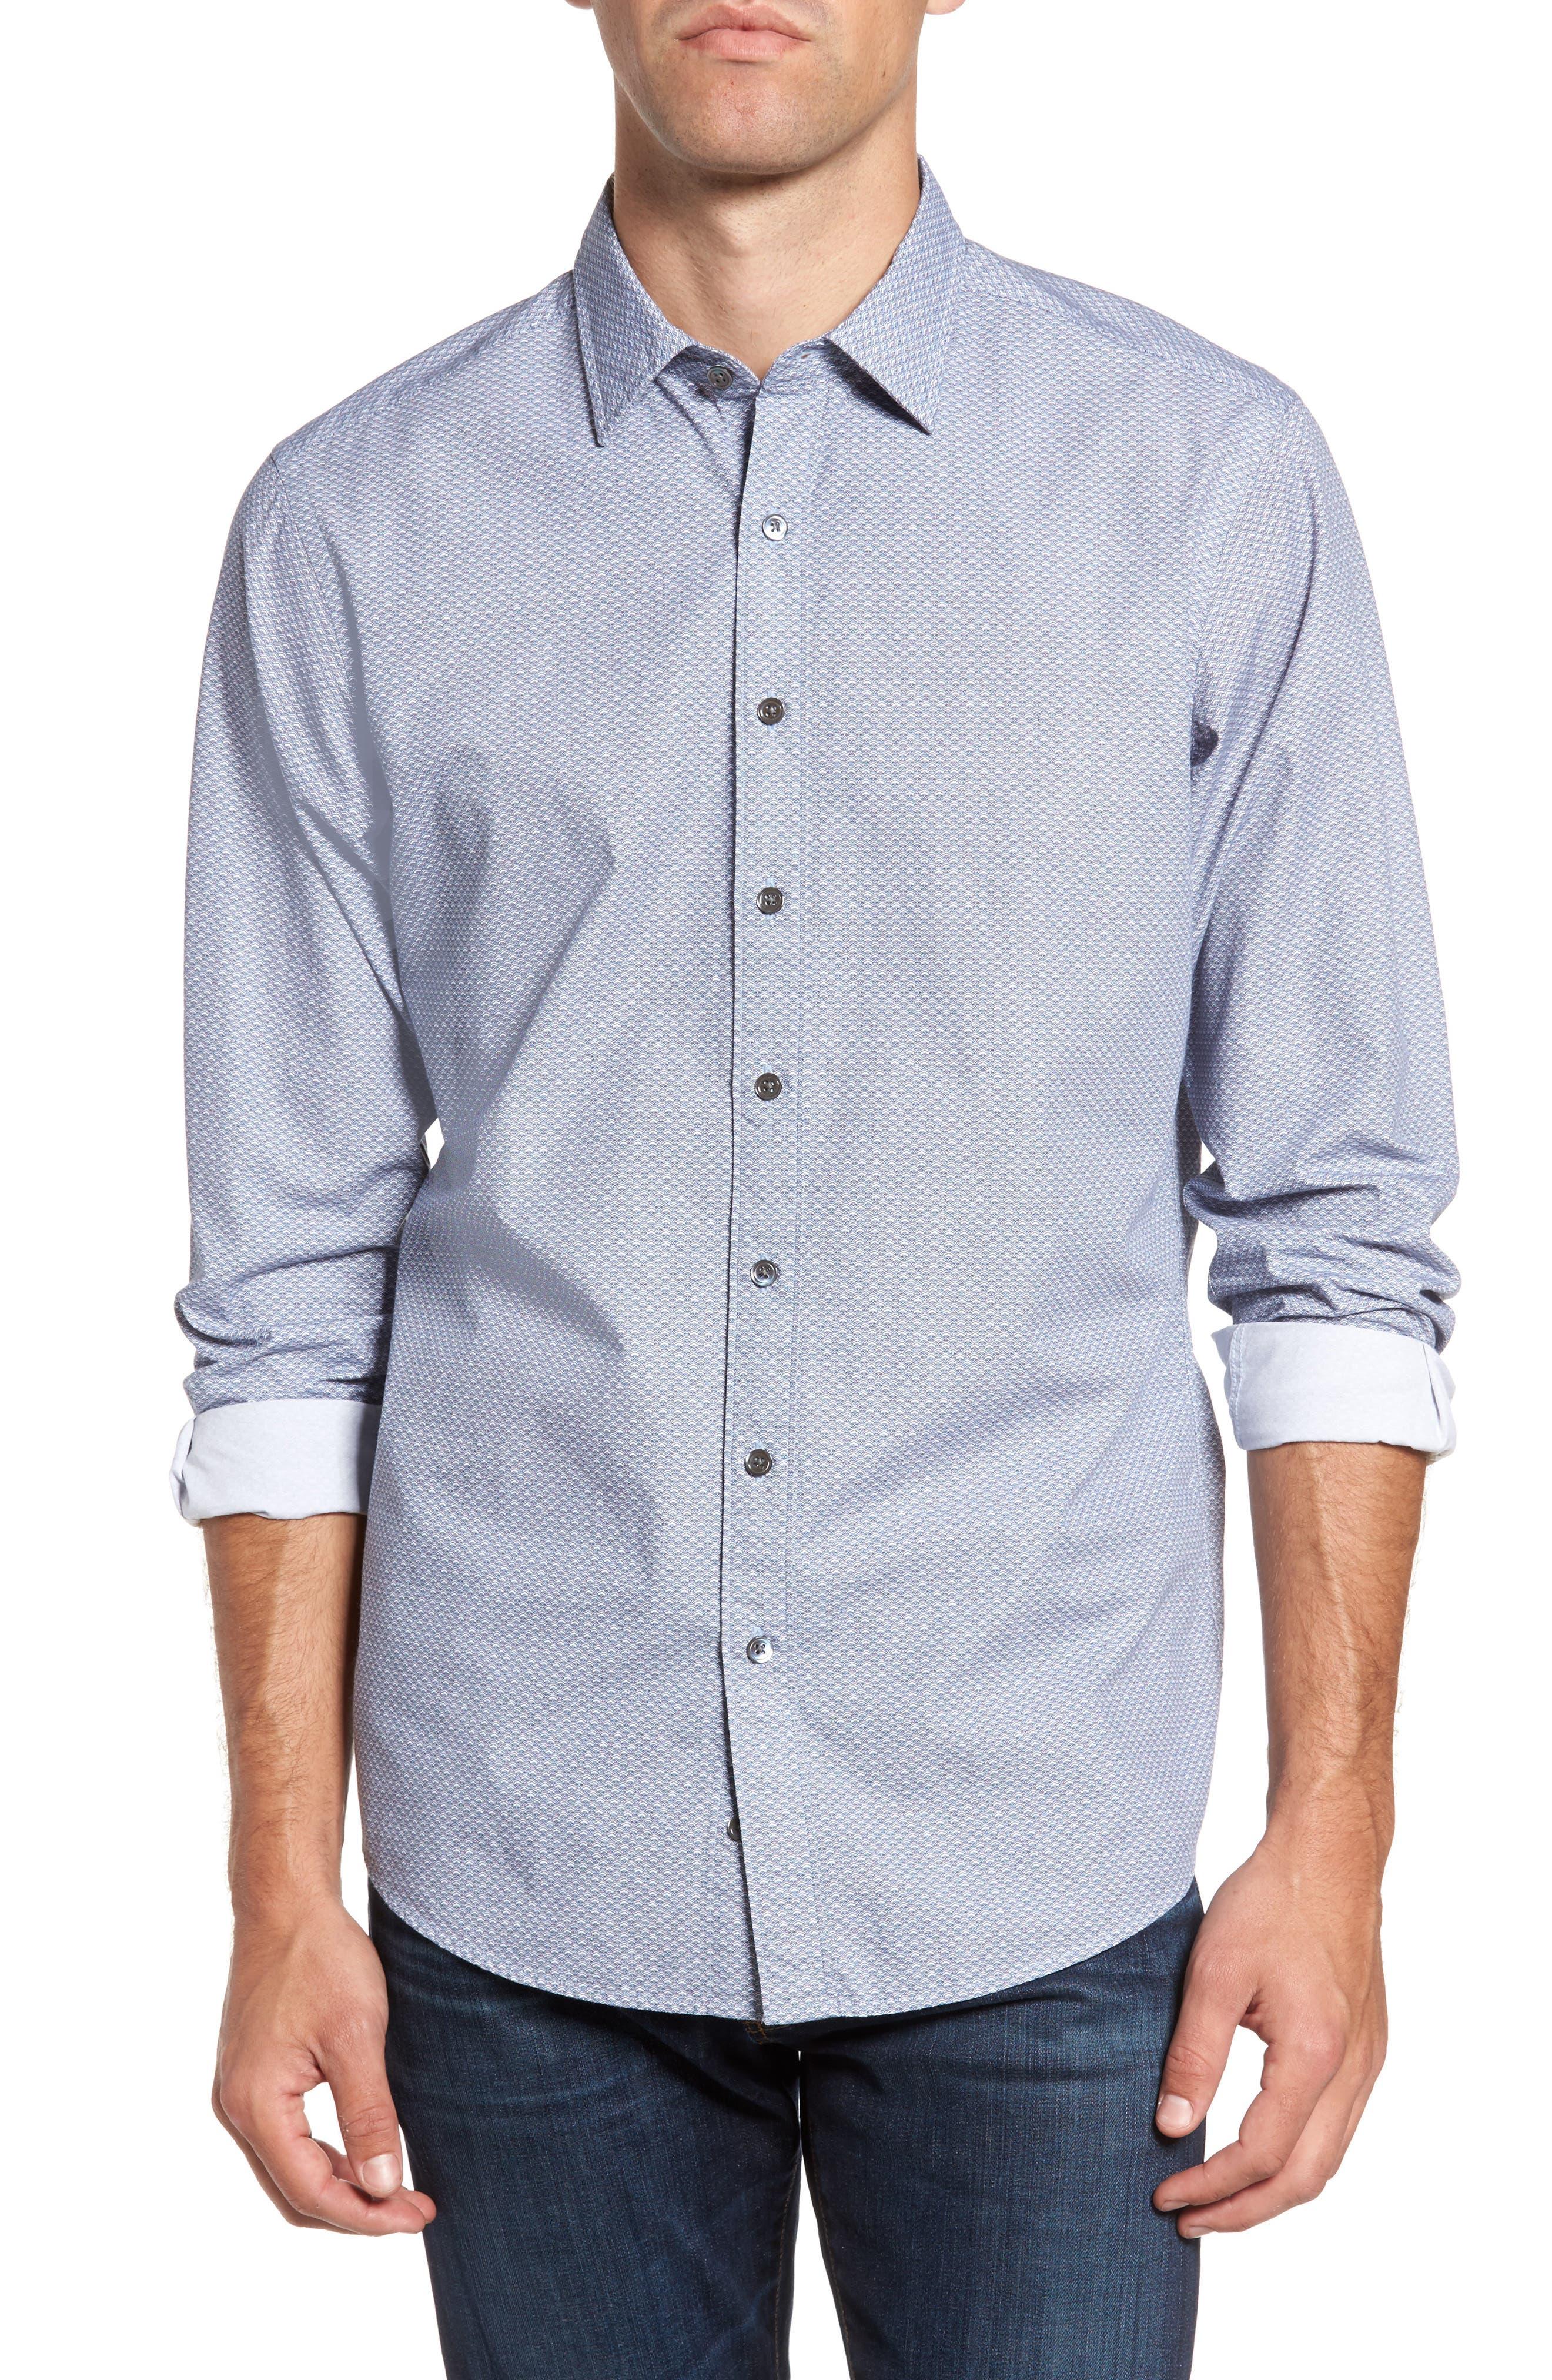 Alternate Image 1 Selected - Rodd & Gunn Macauley Sports Fit Print Sport Shirt